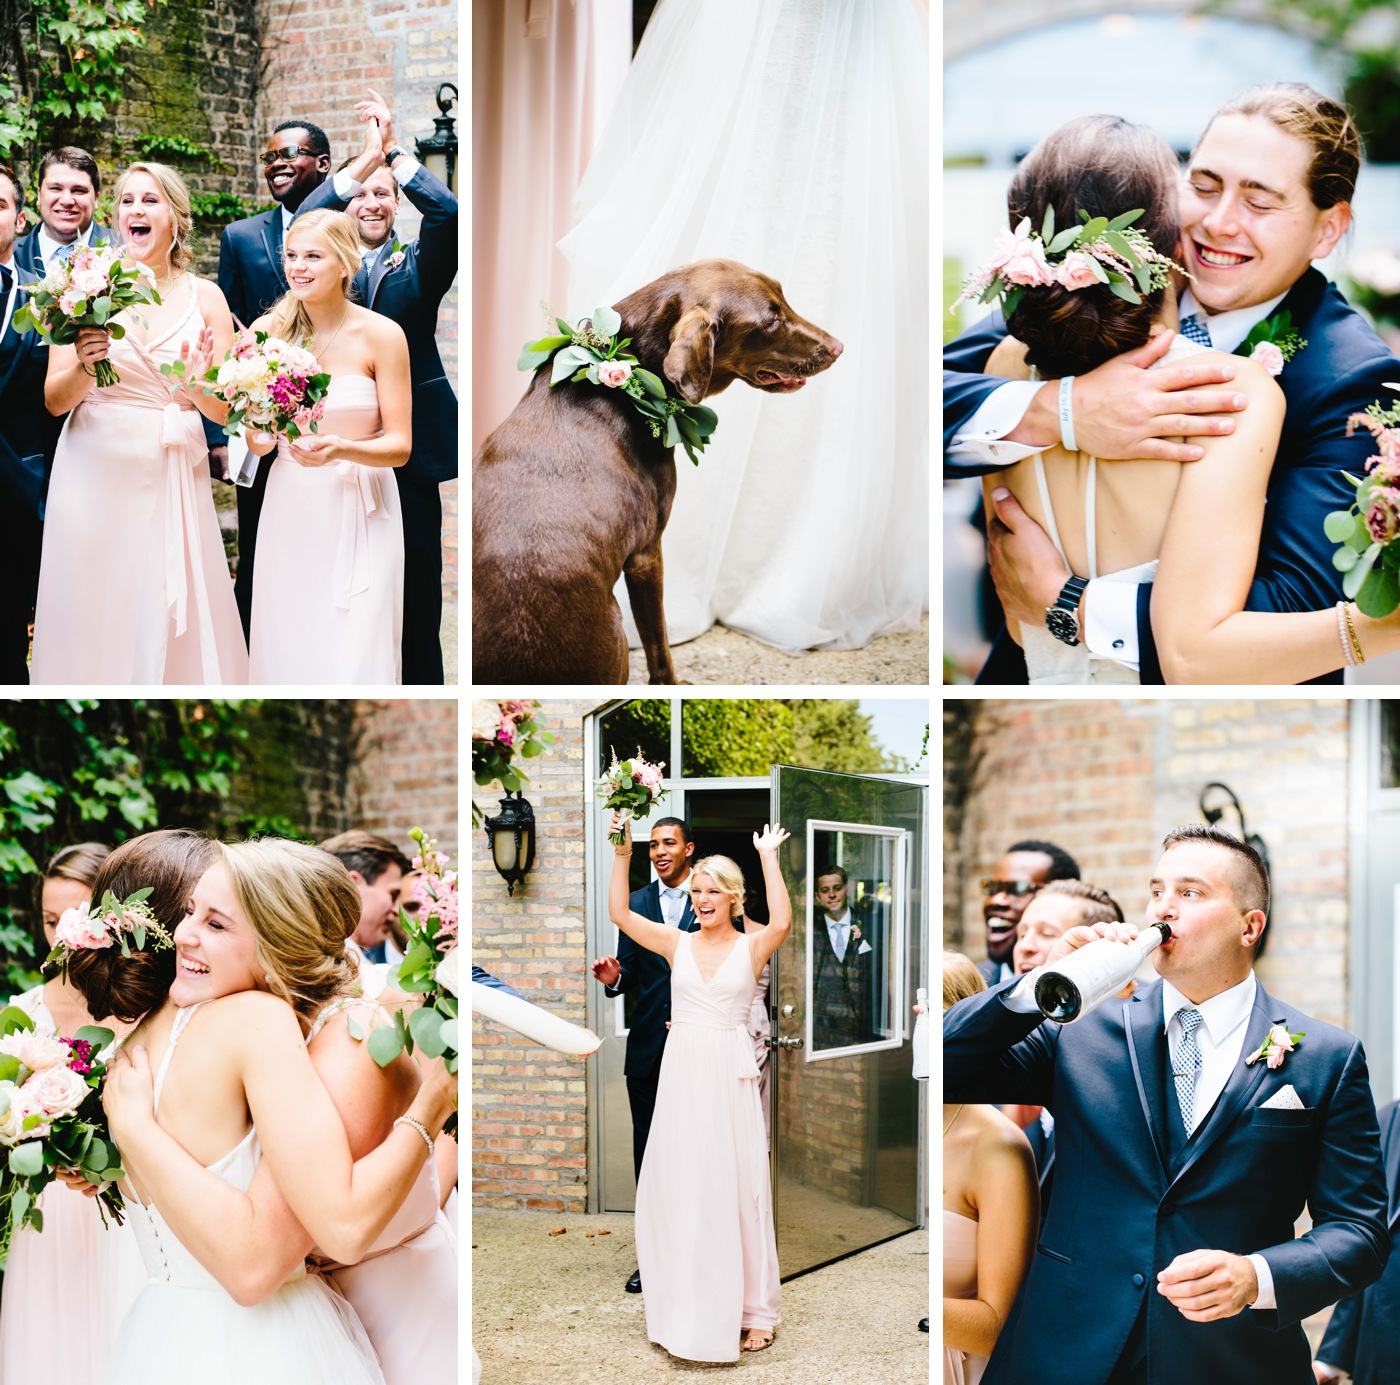 chicago-fine-art-wedding-photography-tyma35